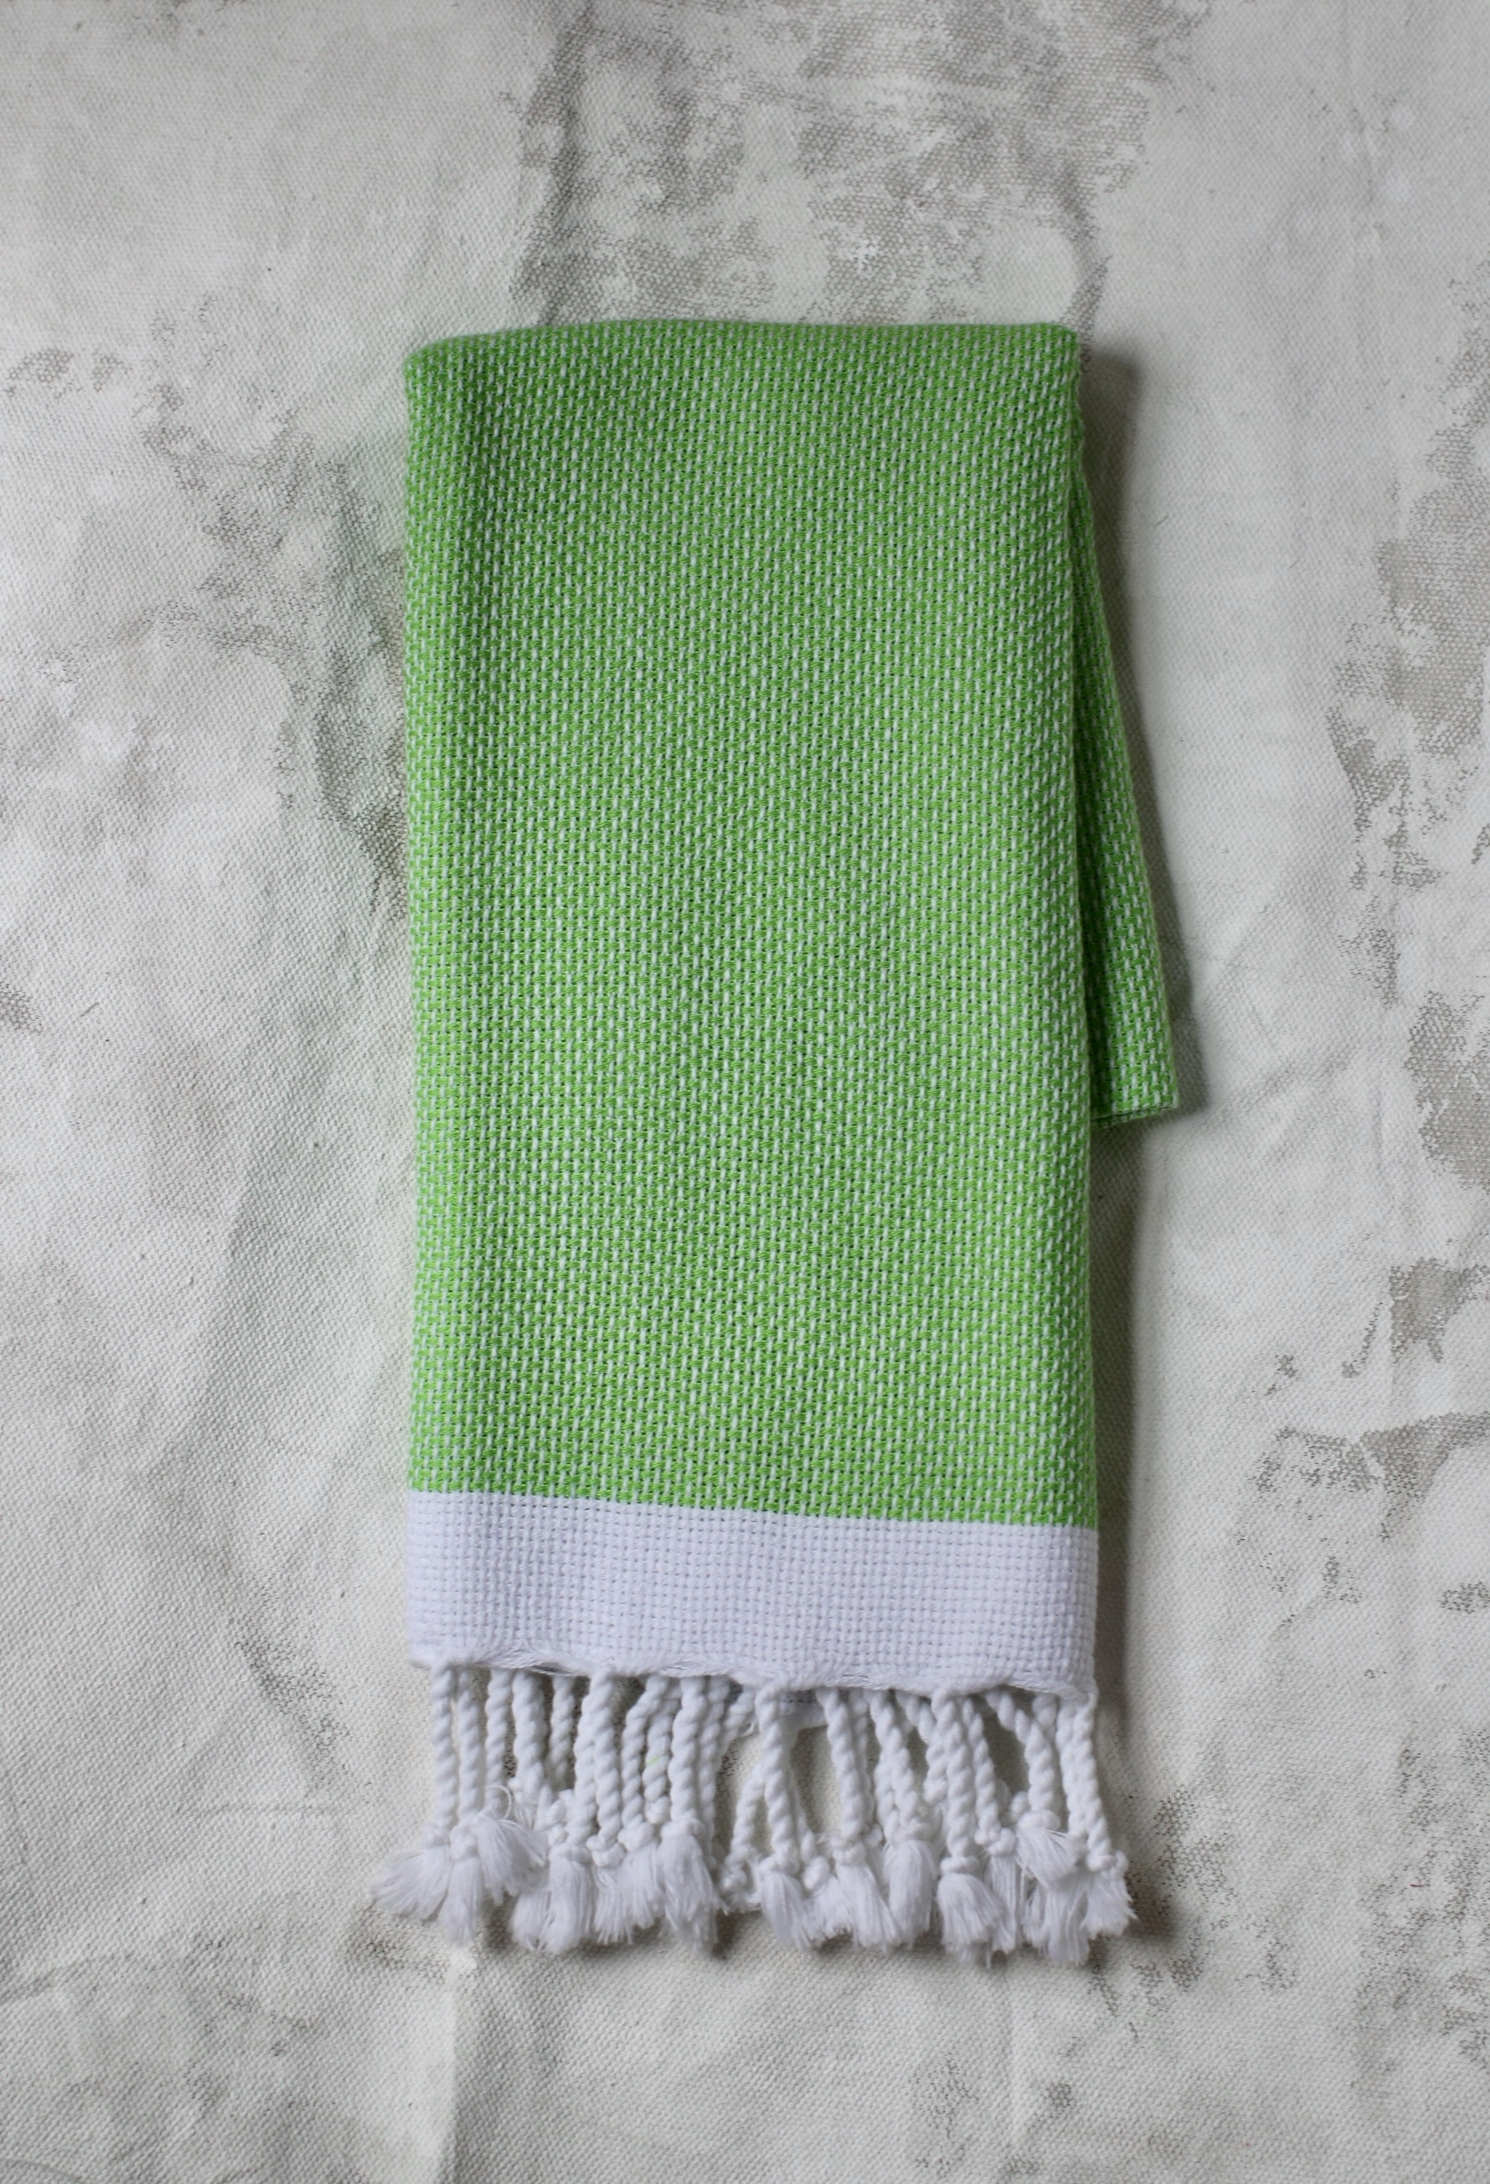 Large Knit Peskir - Bright Green $22